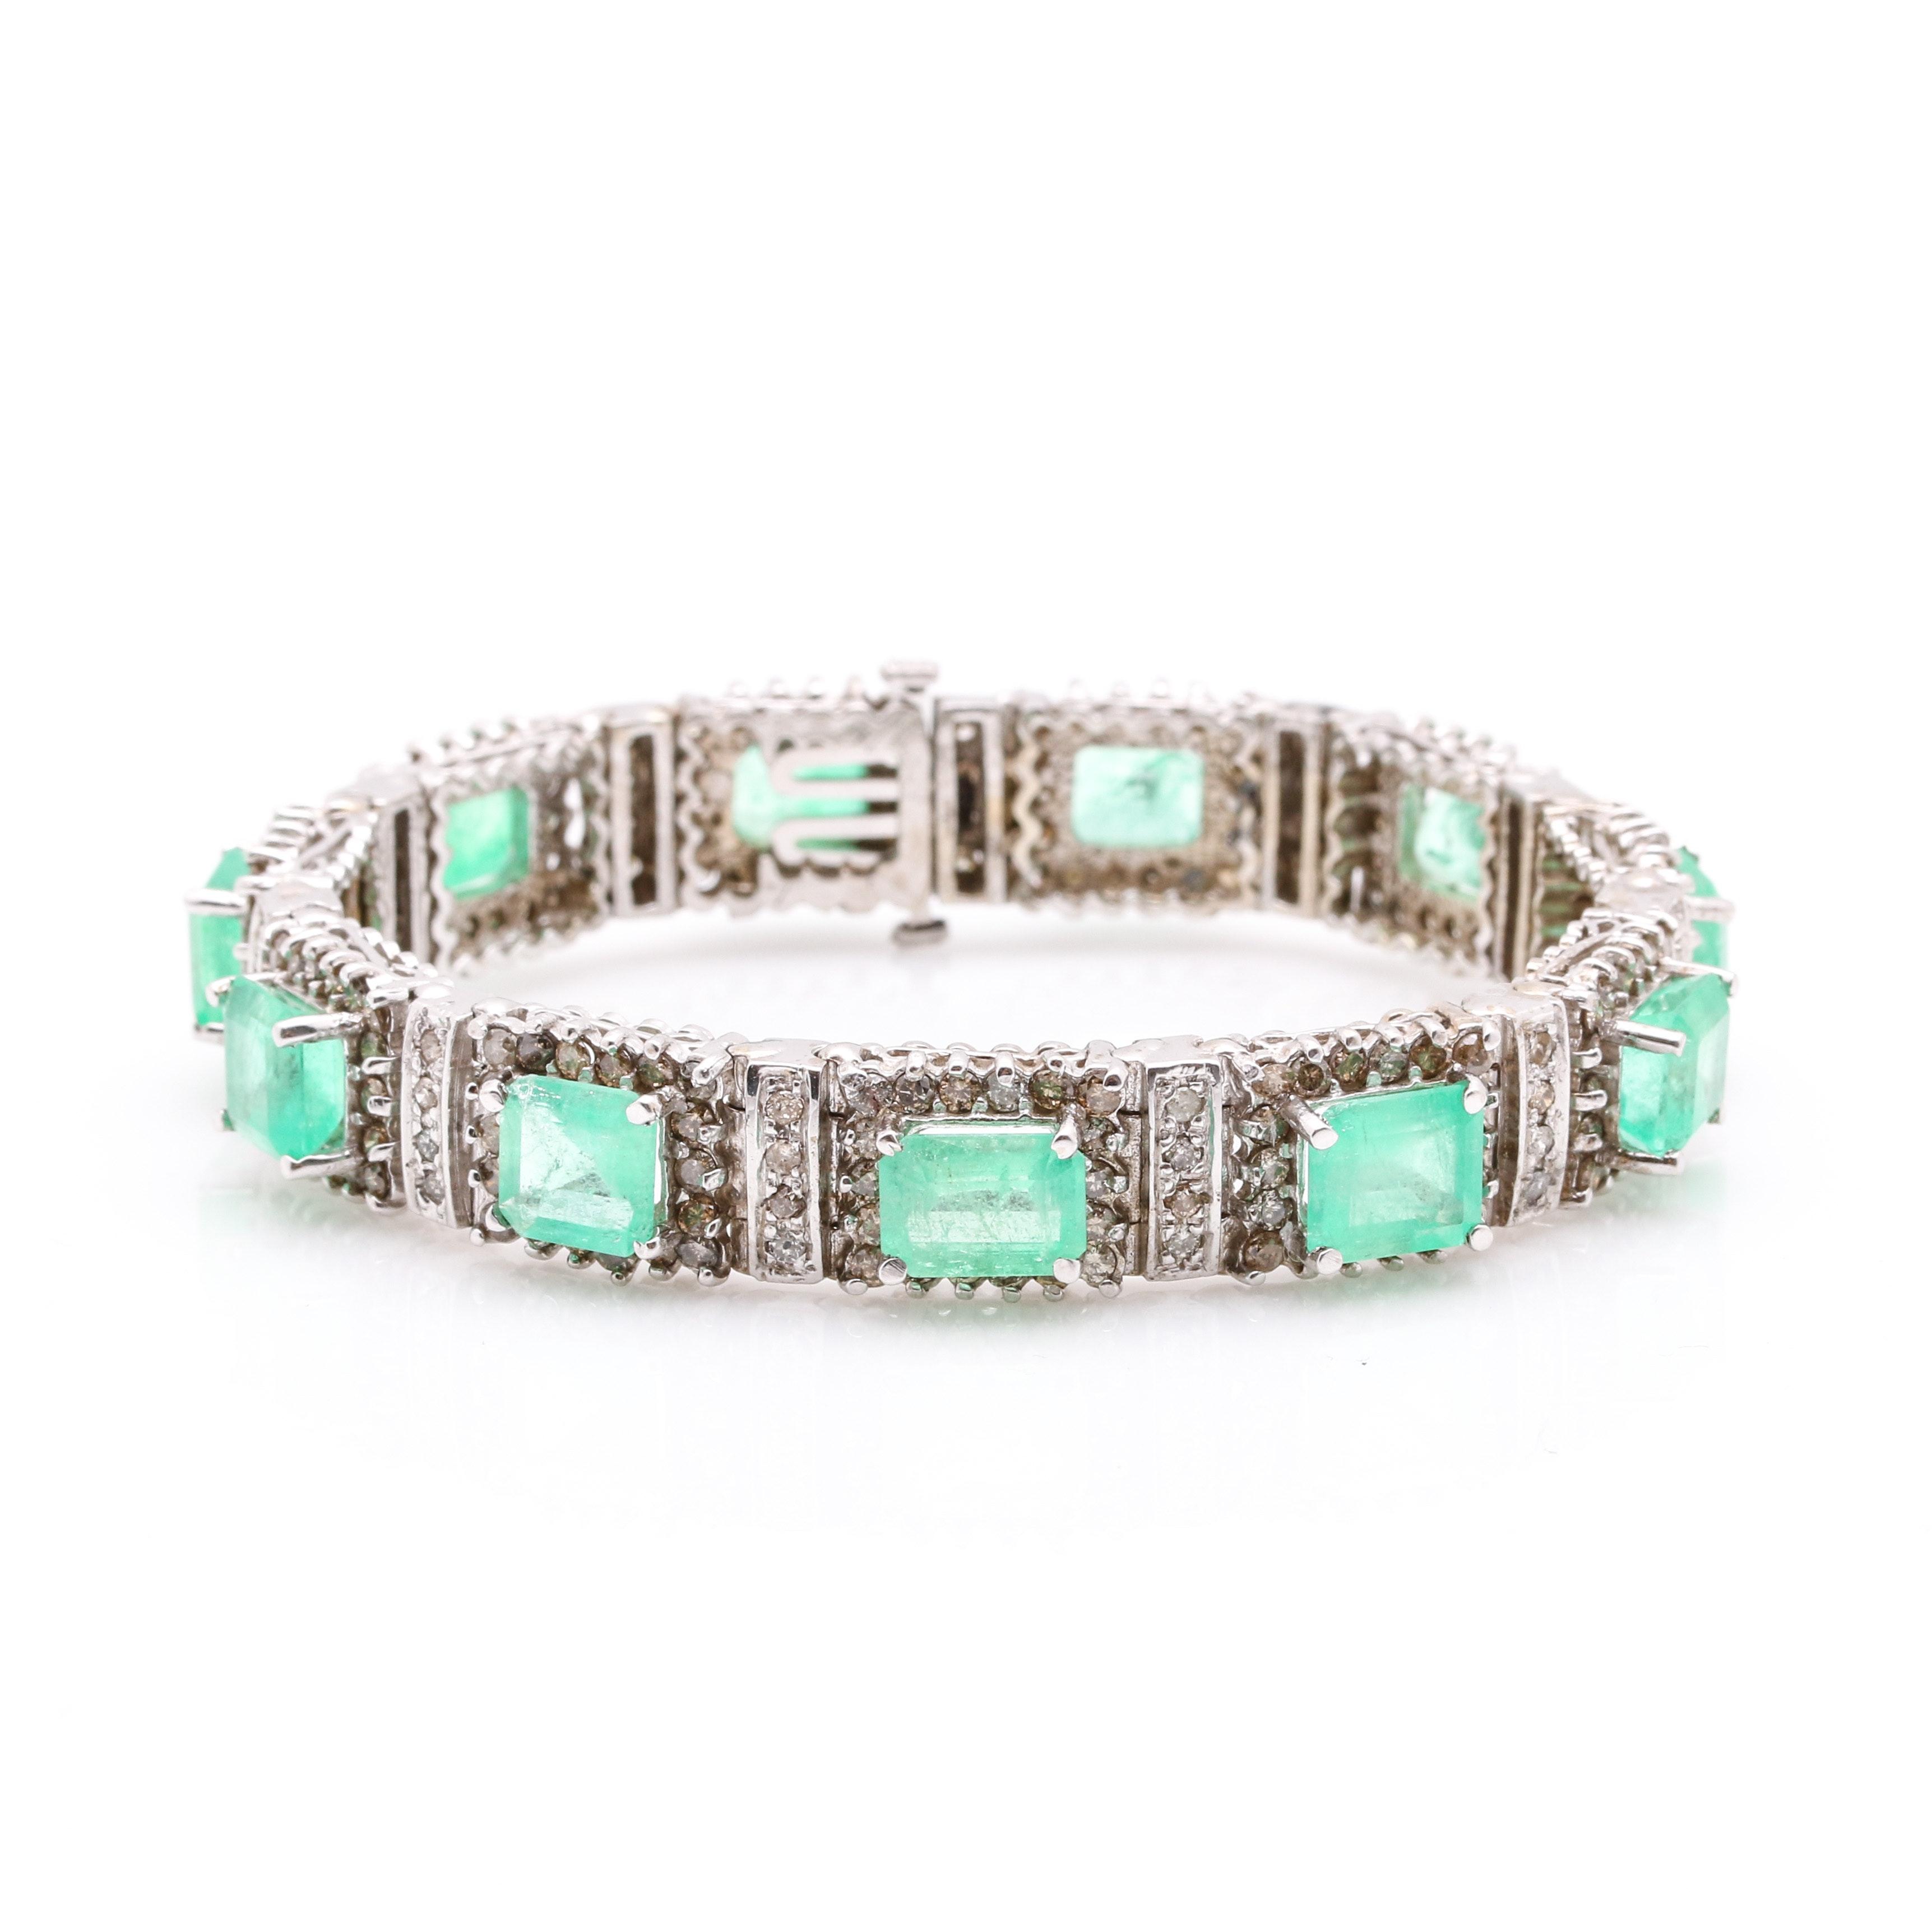 14K White Gold 20.79 CTW Emerald and 12.50 CTW Diamond Flexible Bracelet